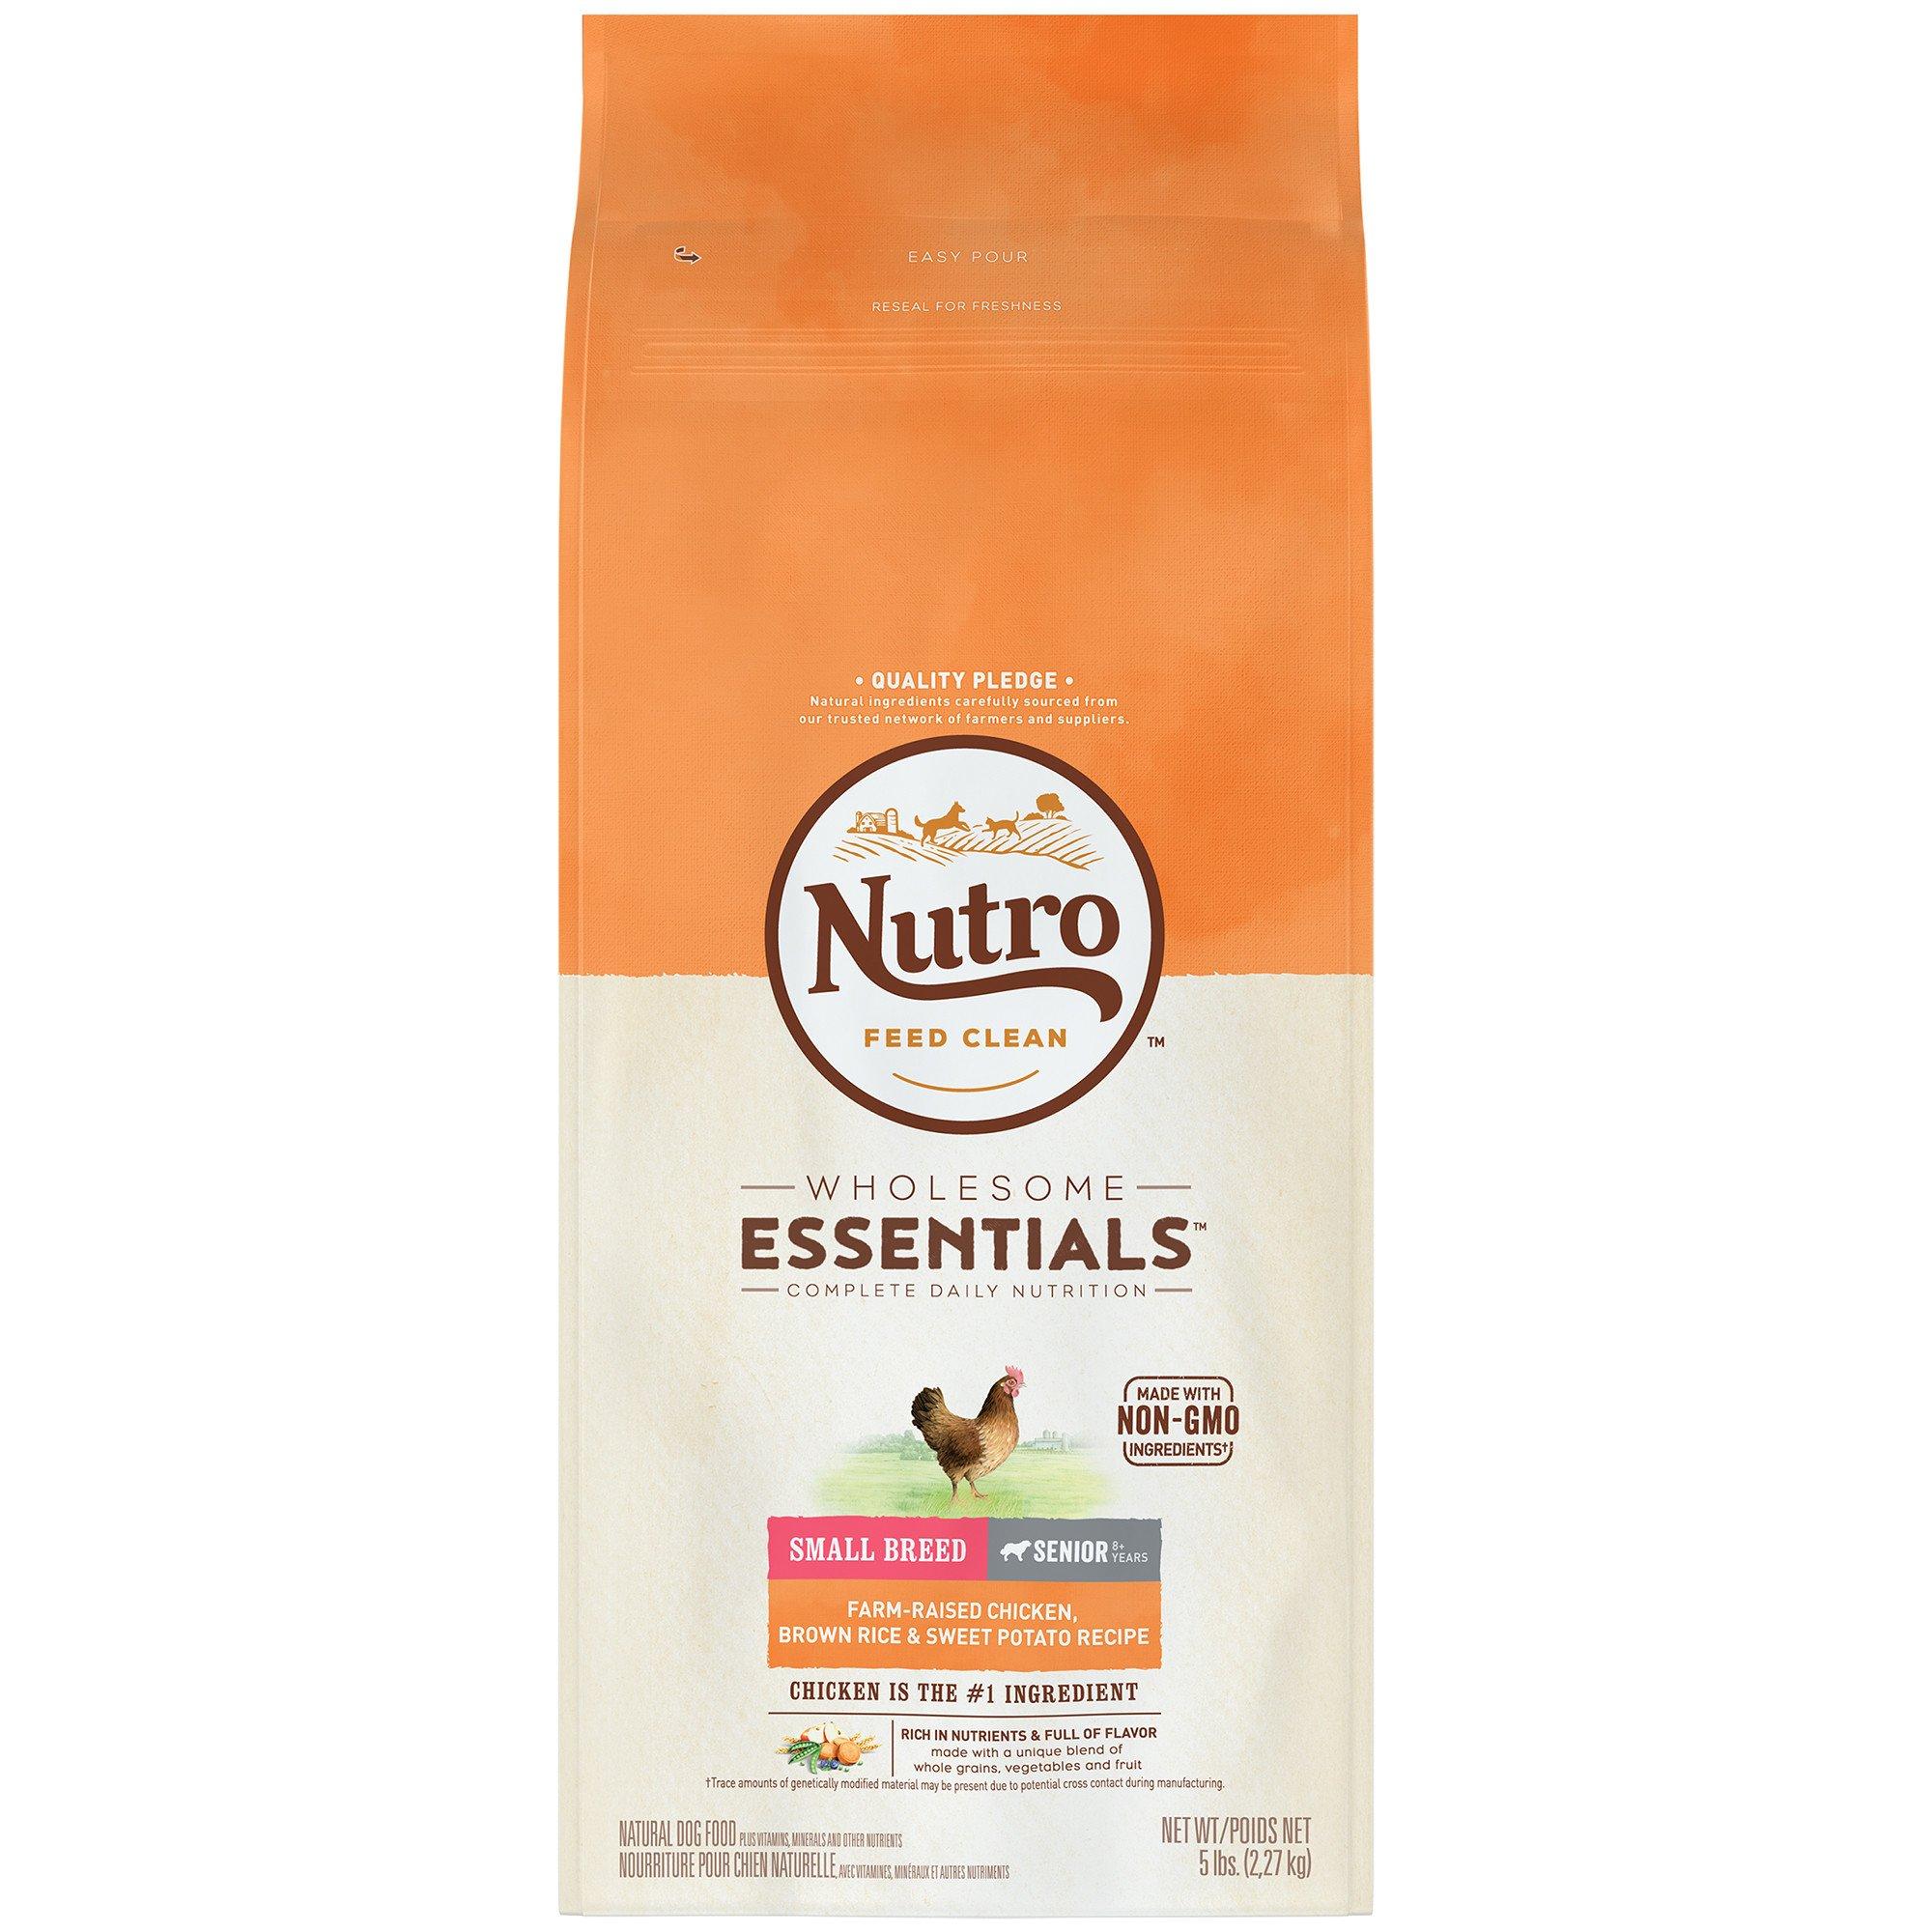 Nutro Wholesome Essentials Farm Raised Chicken Brown Rice Sweet